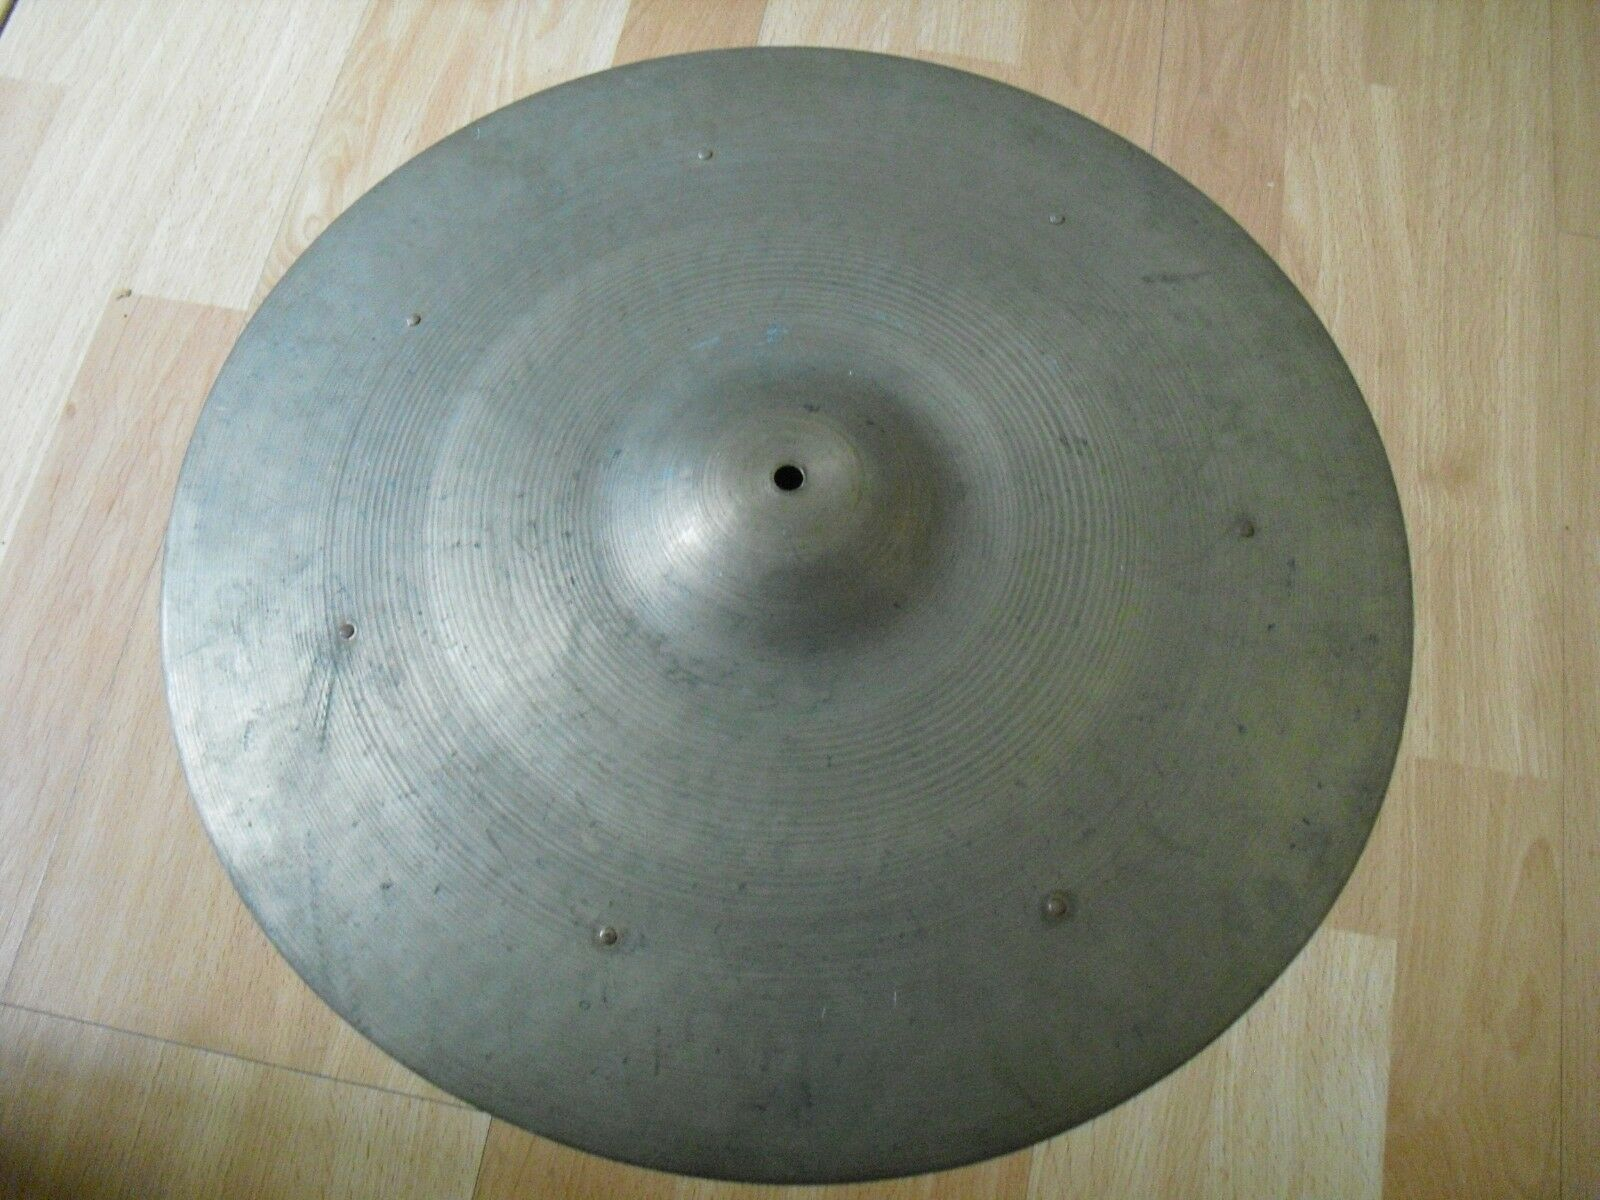 20  Vintage 40s Trans Stamp Avedis Zildjian Sizzle Ride Cymbal 2380g